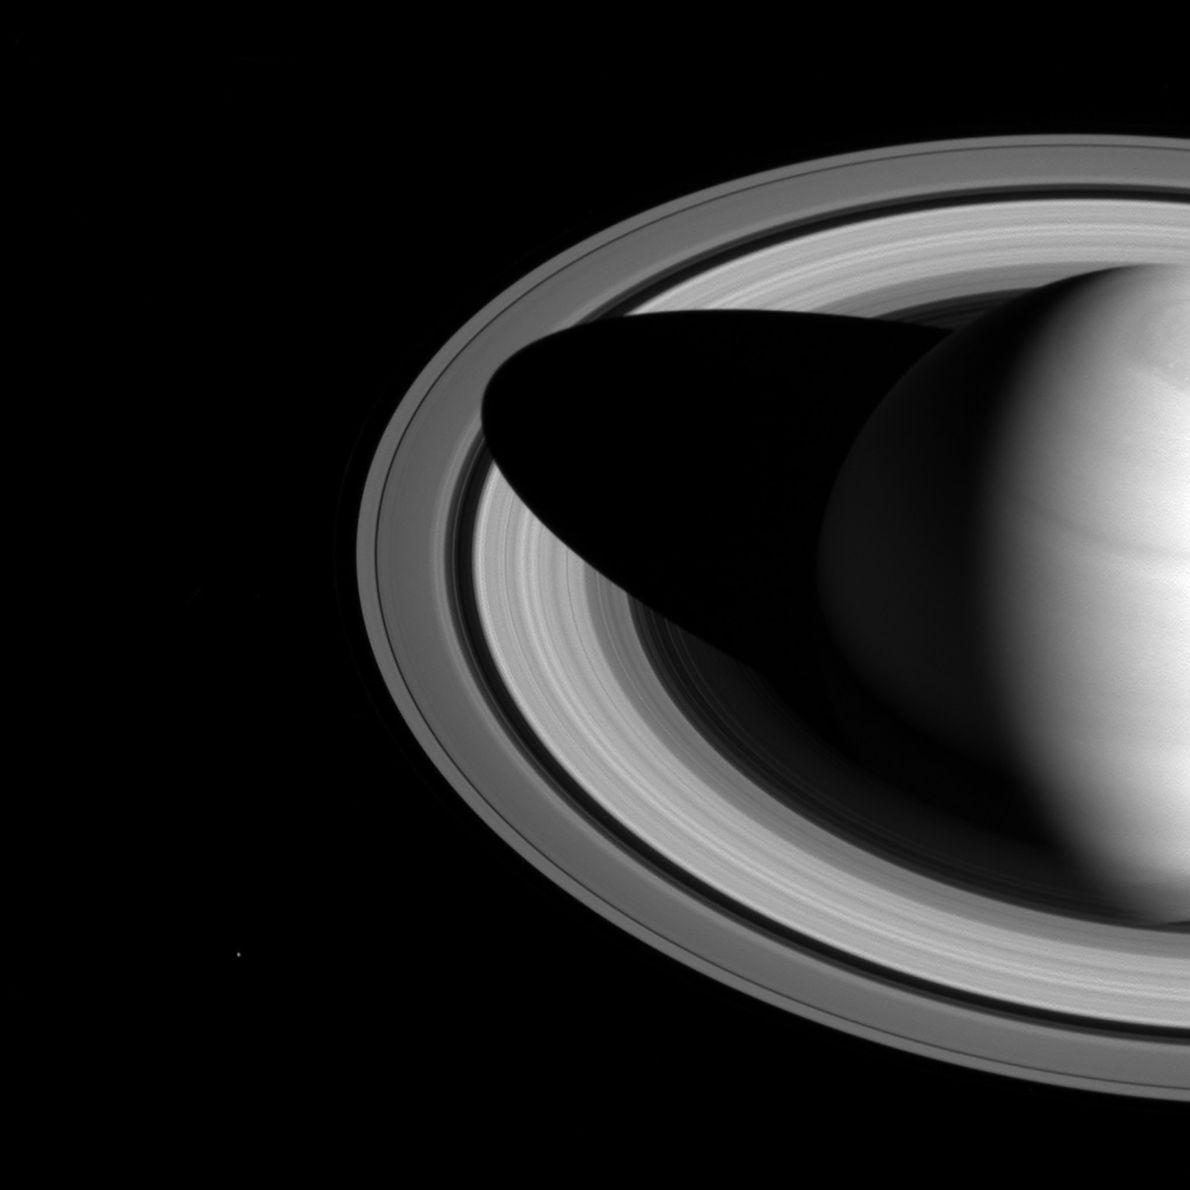 Saturno proyecta una oscura sombra